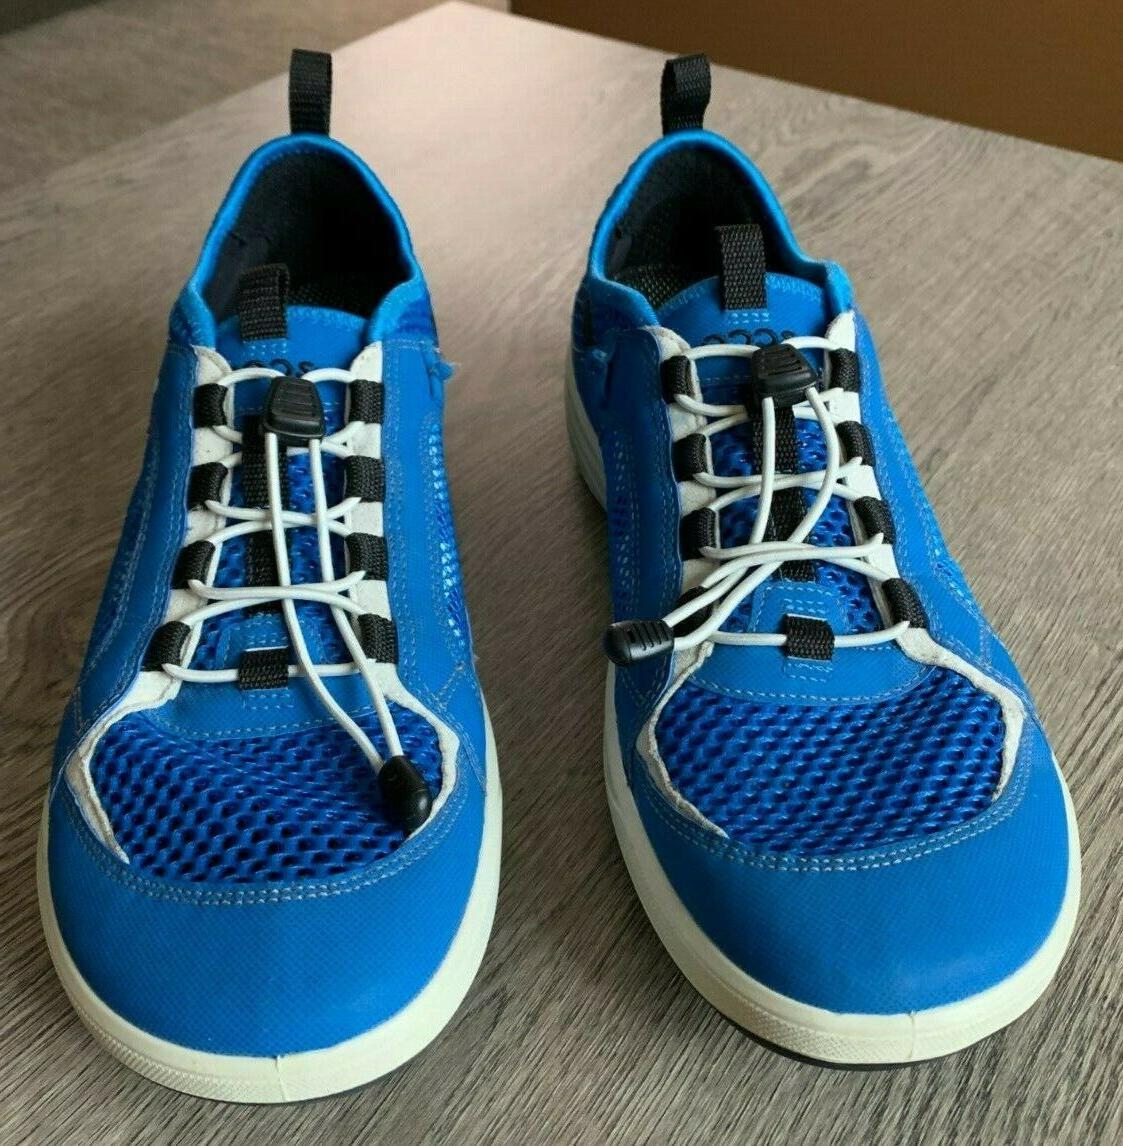 aqua sport water shoes blue women s